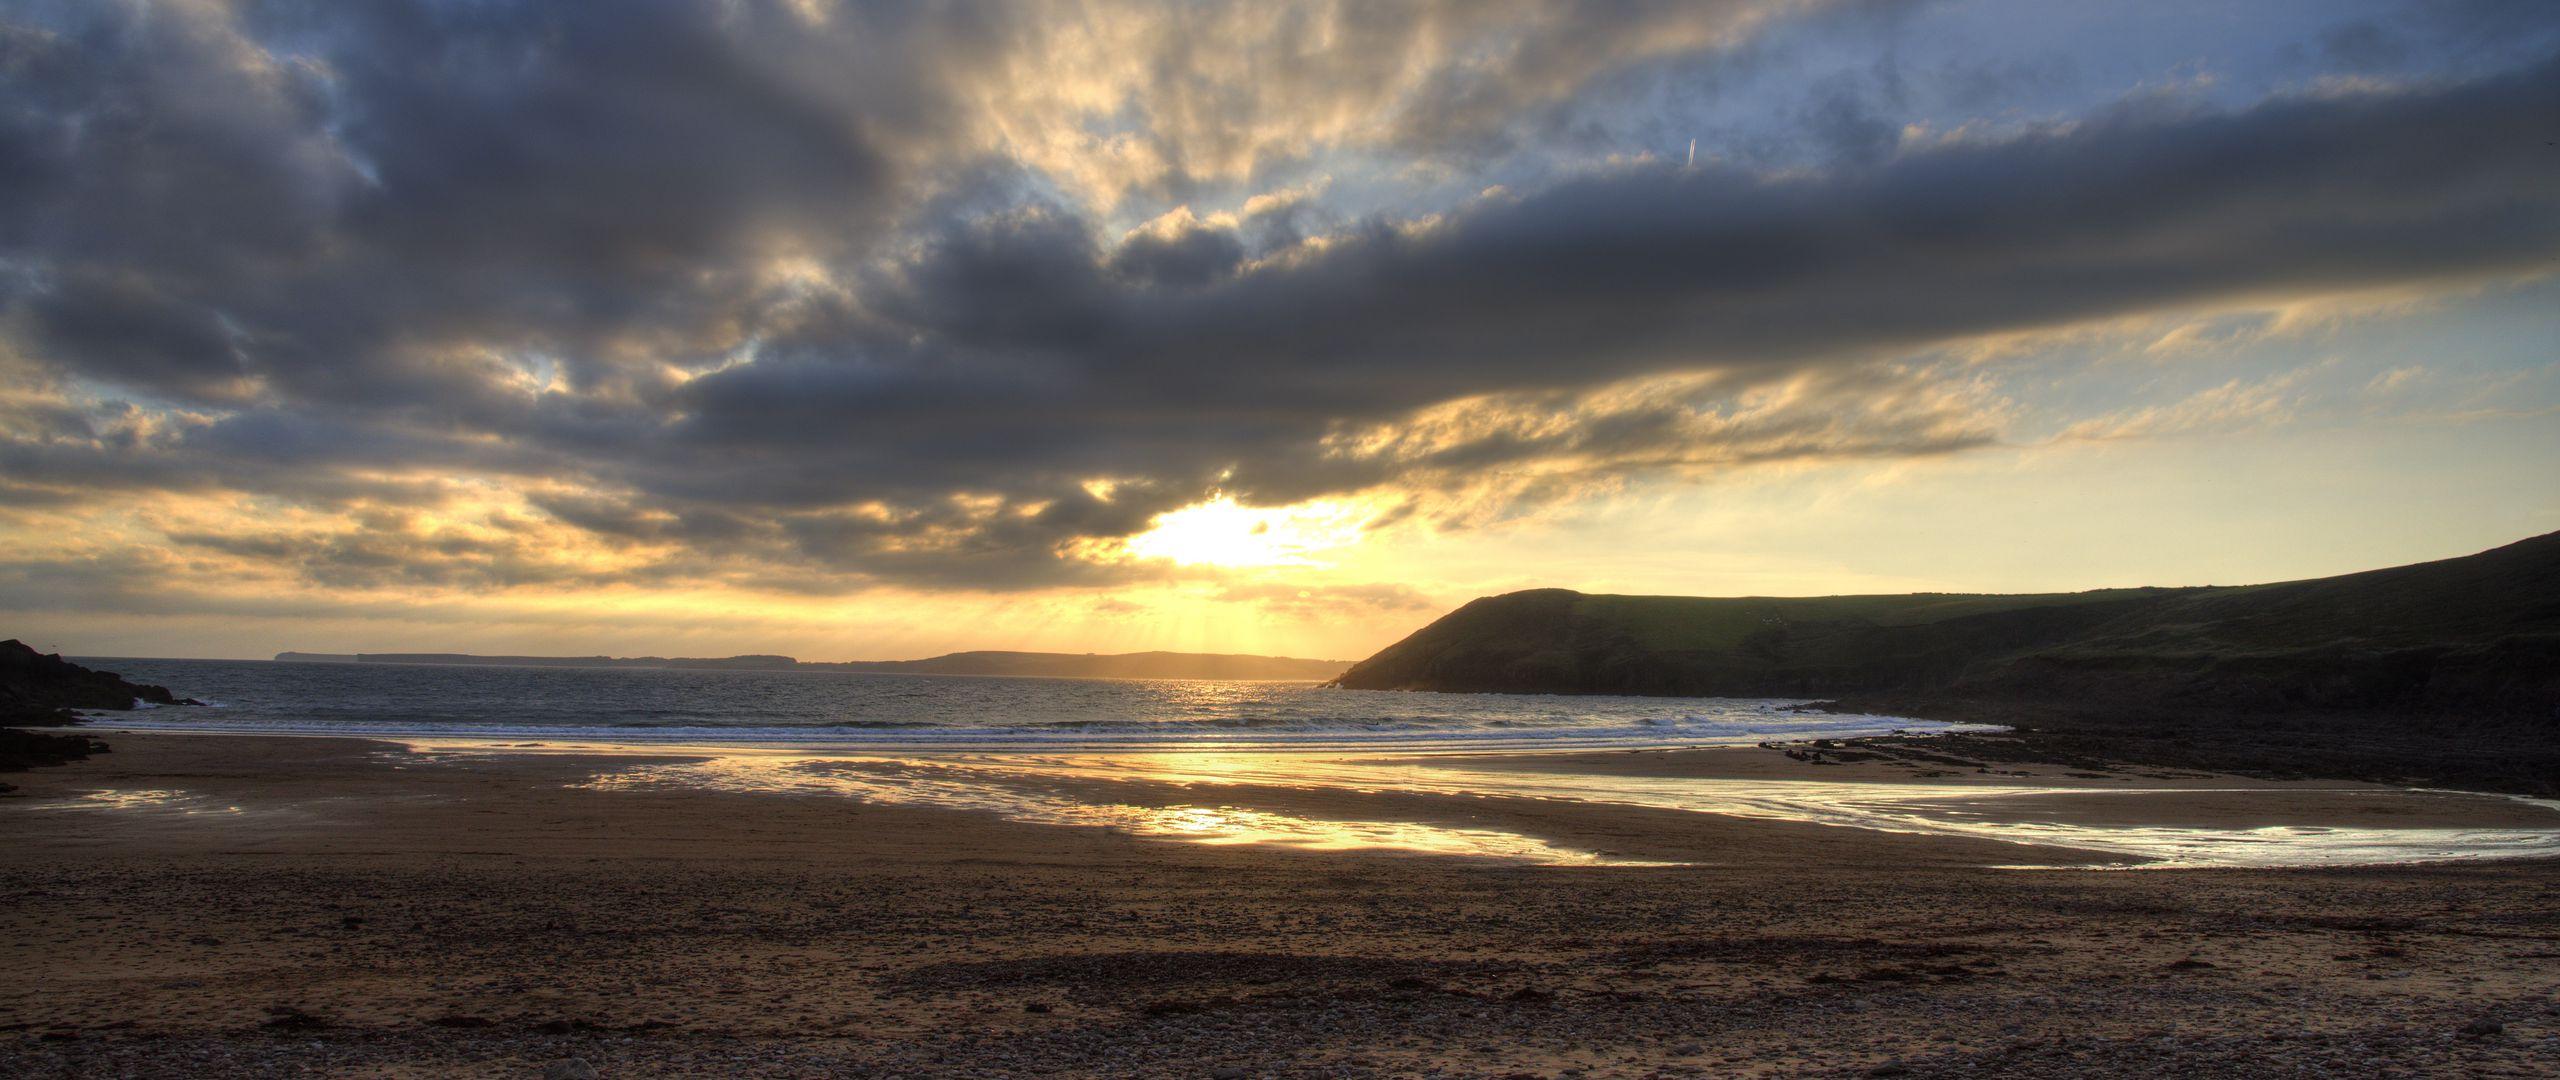 2560x1080 Wallpaper shore, water, sunset, landscape